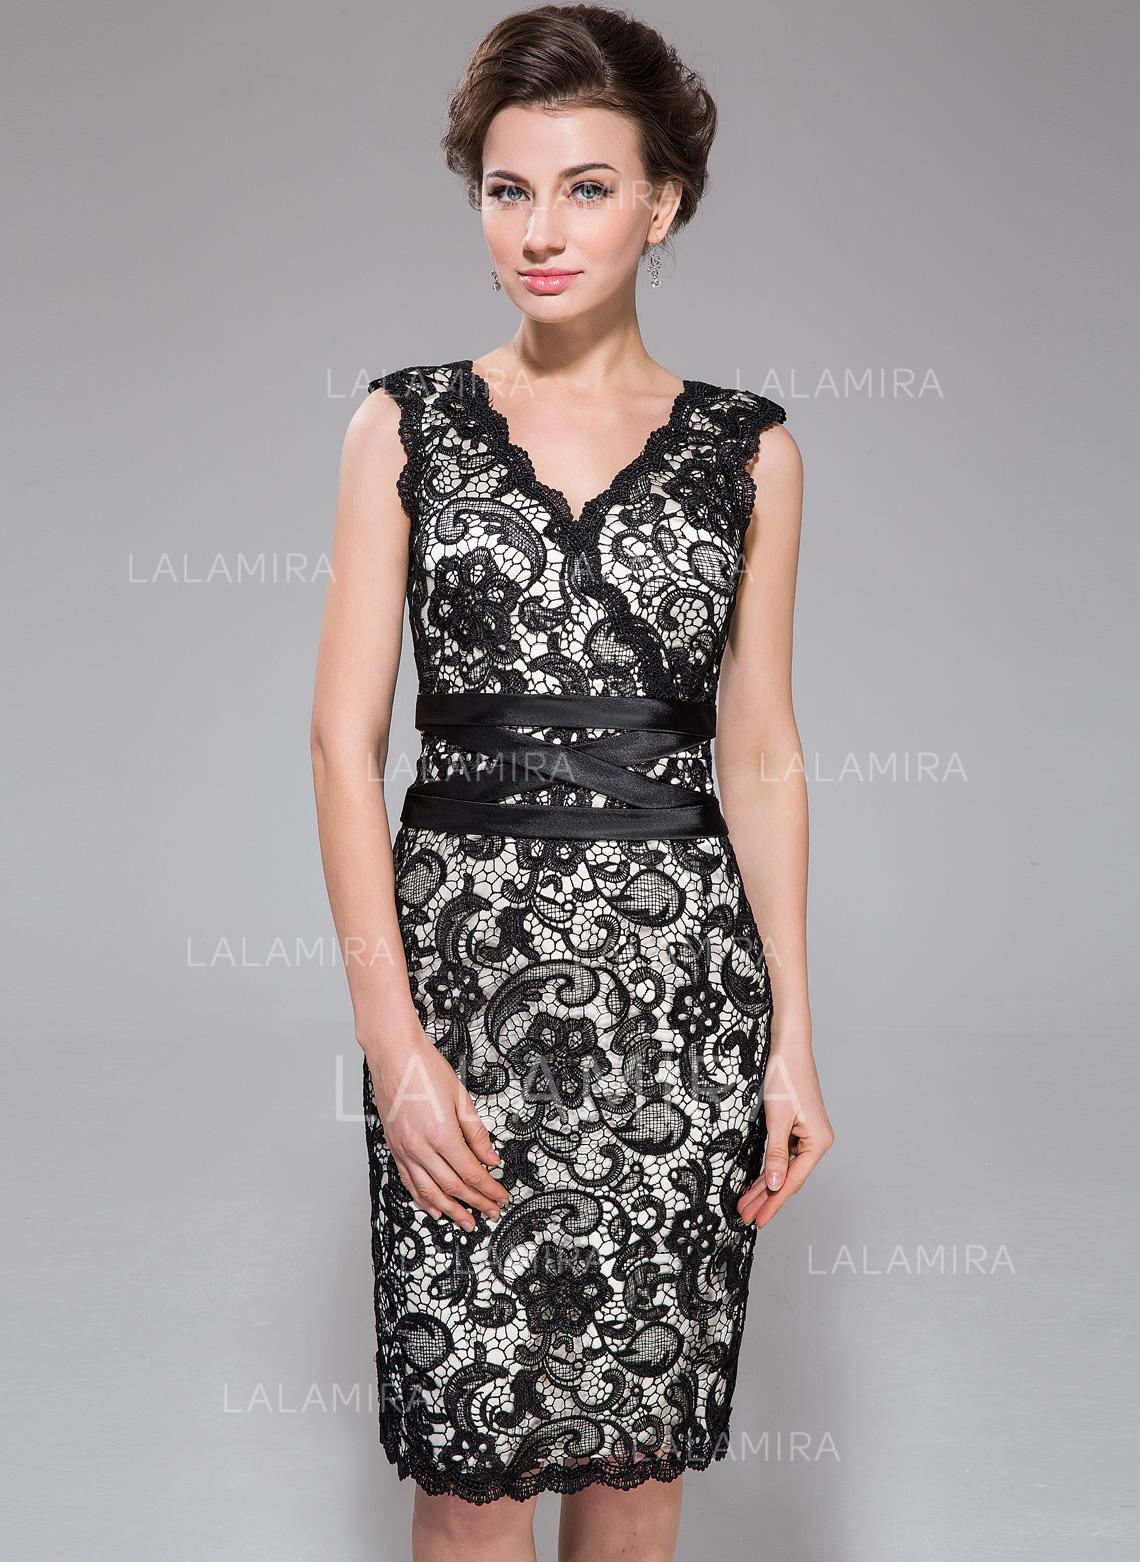 6da12aa670f83 Sleeveless V-neck Stunning Charmeuse Lace Sheath/Column Cocktail Dresses  (016211506). Loading zoom